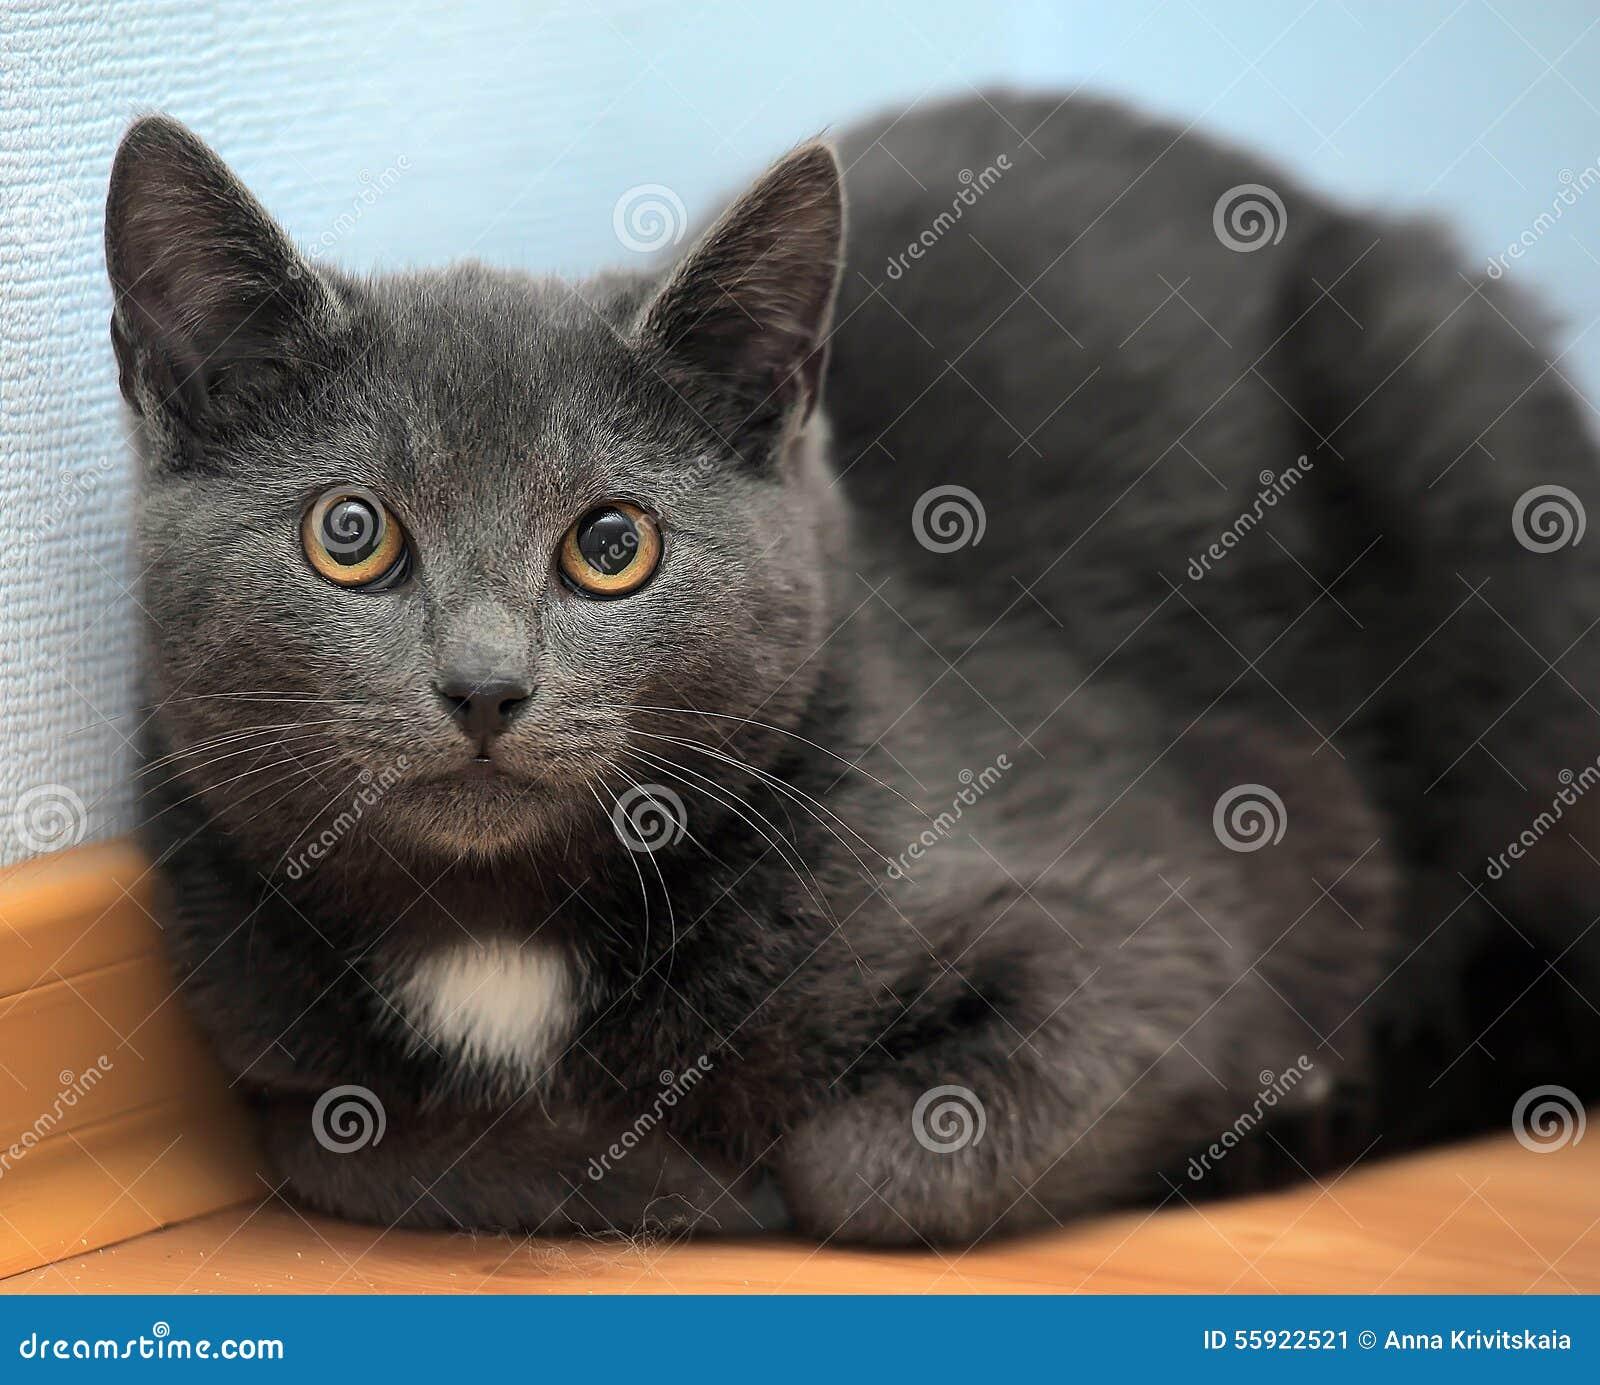 Russian Blue Kitten Stock Image